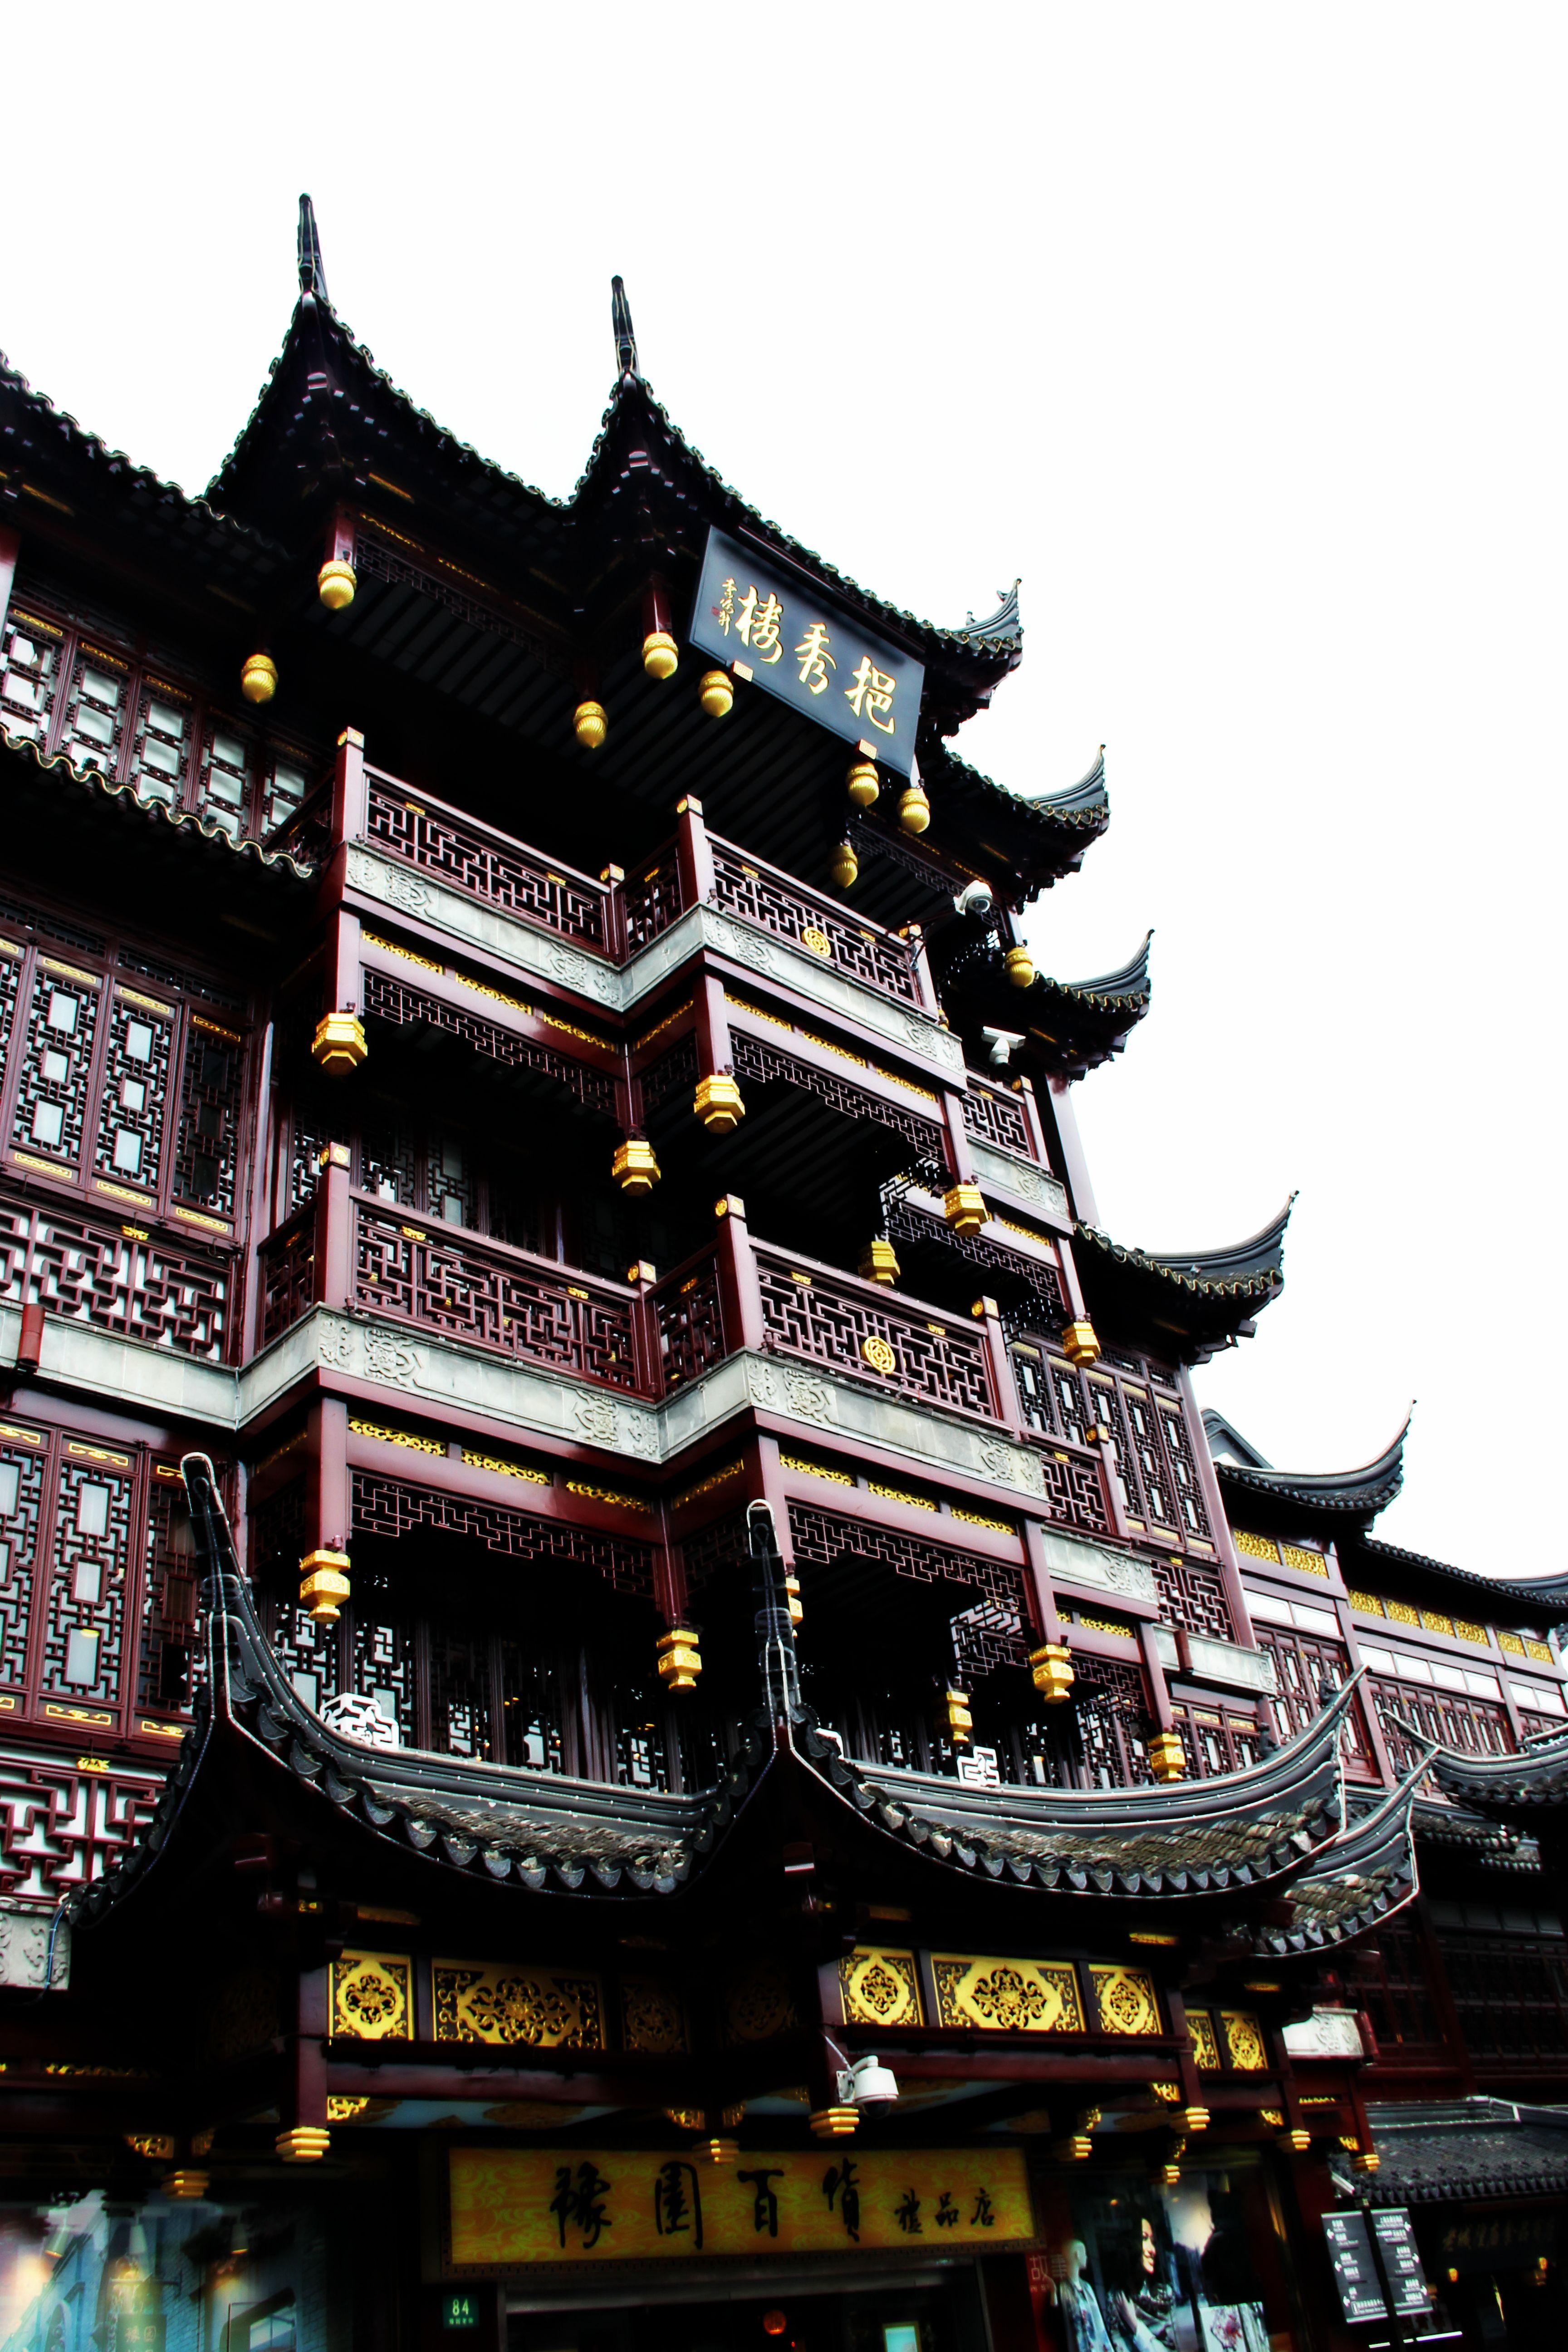 Shanghai garden temples